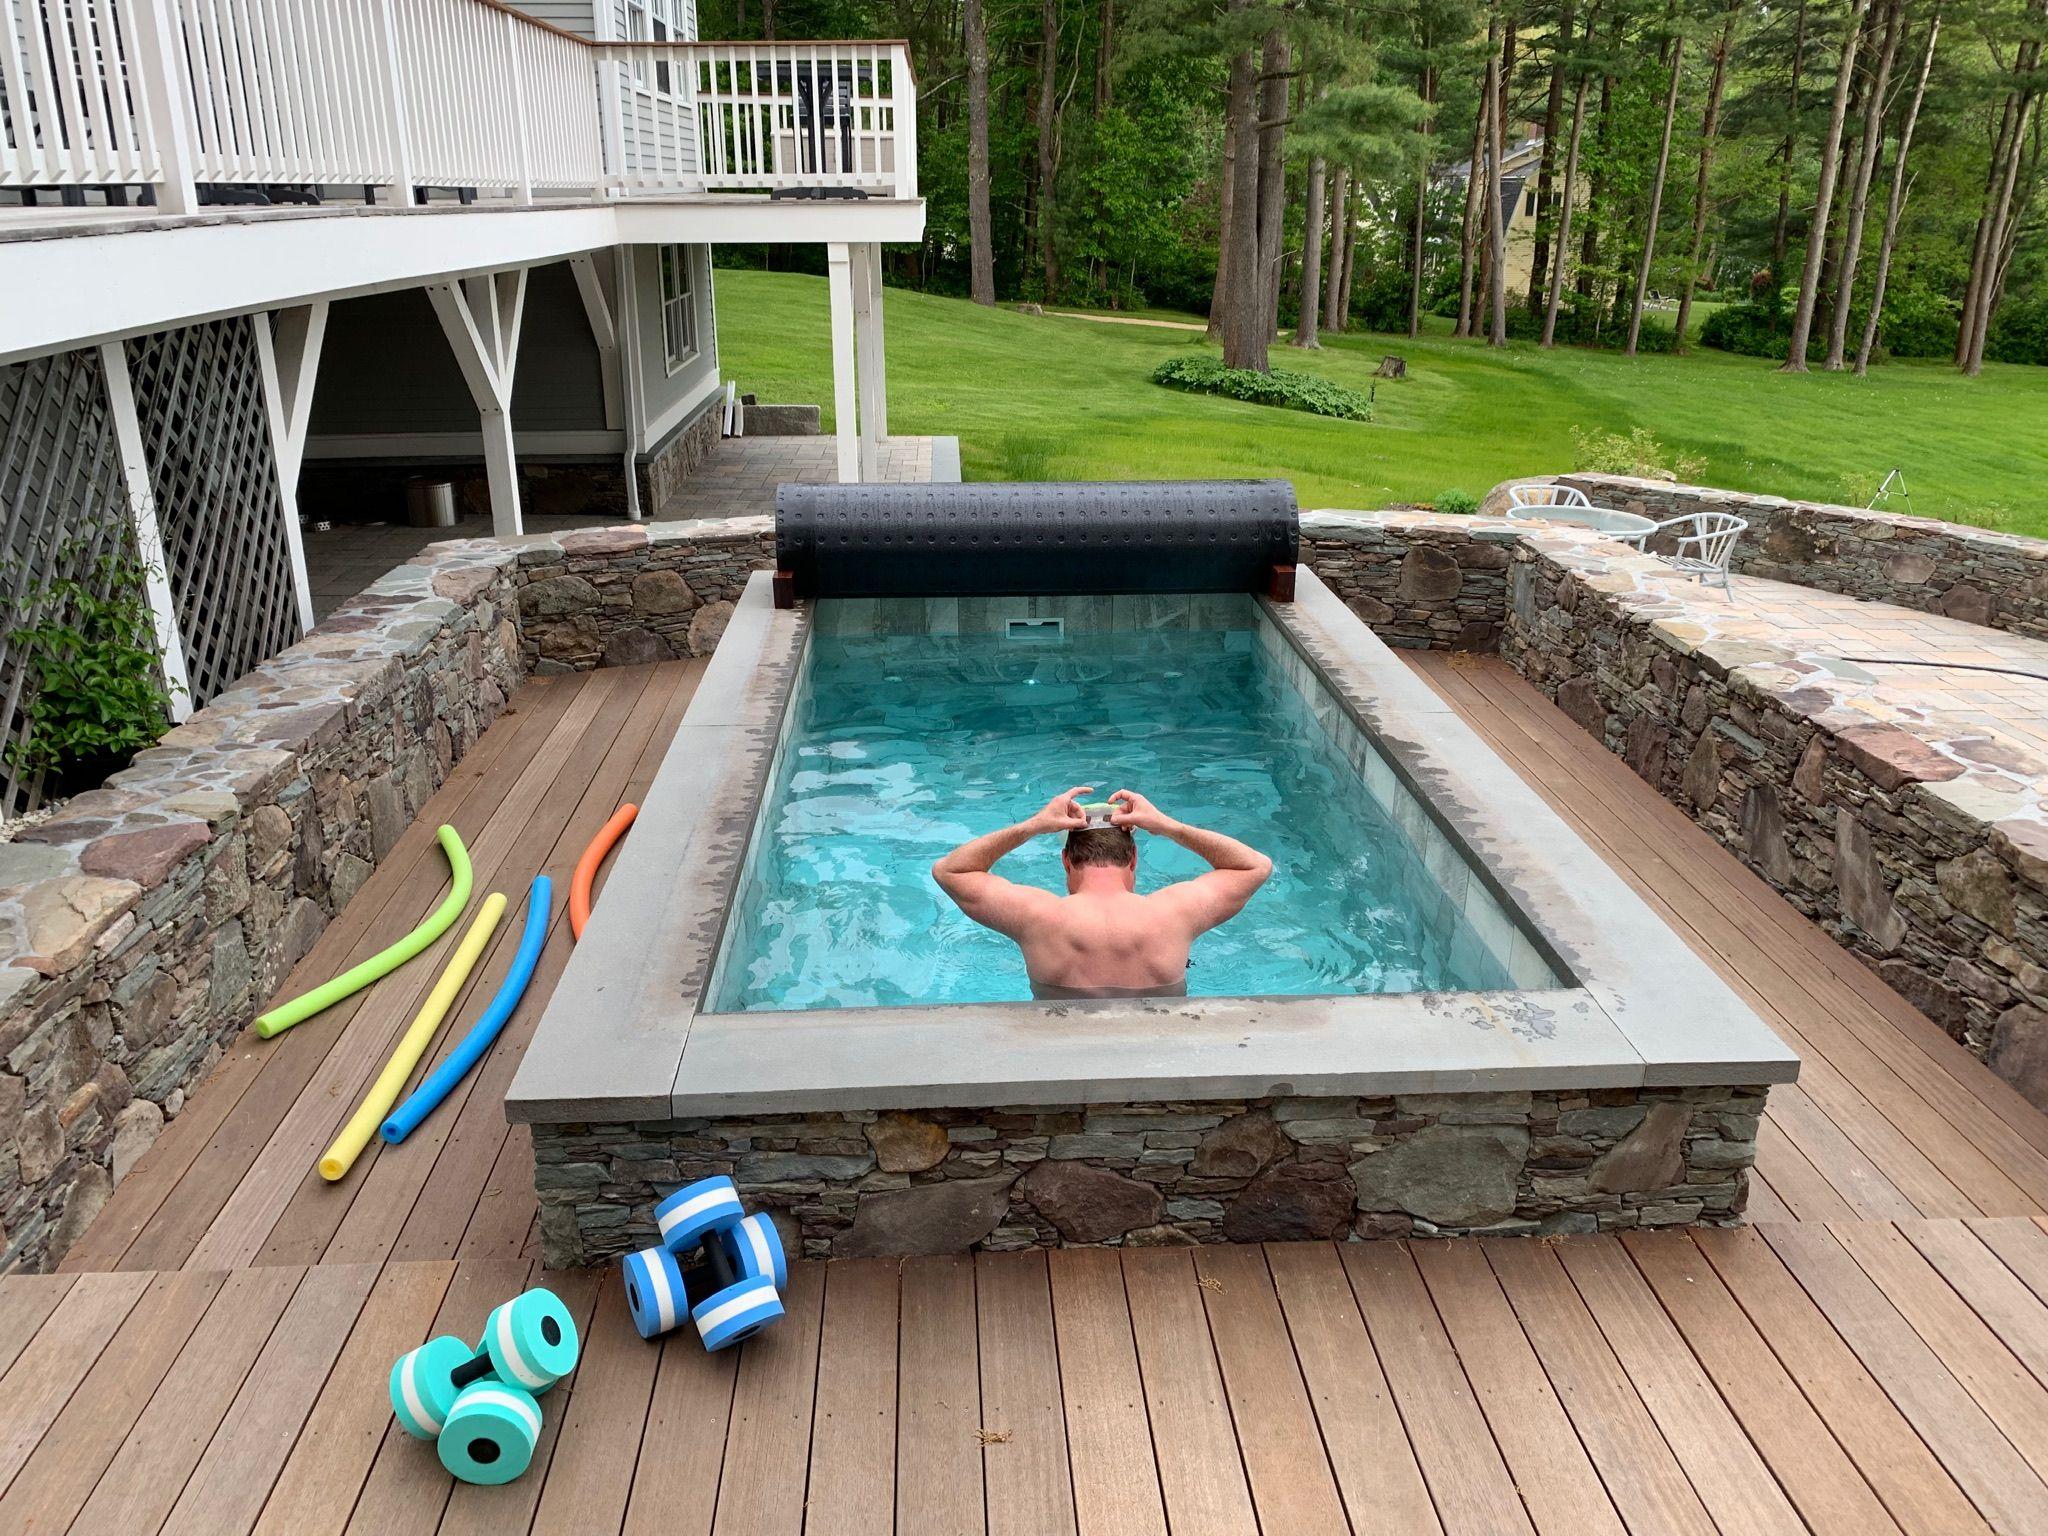 Exercising In A Soake Pool Diy Swimming Pool Small Pools Pool Hot Tub